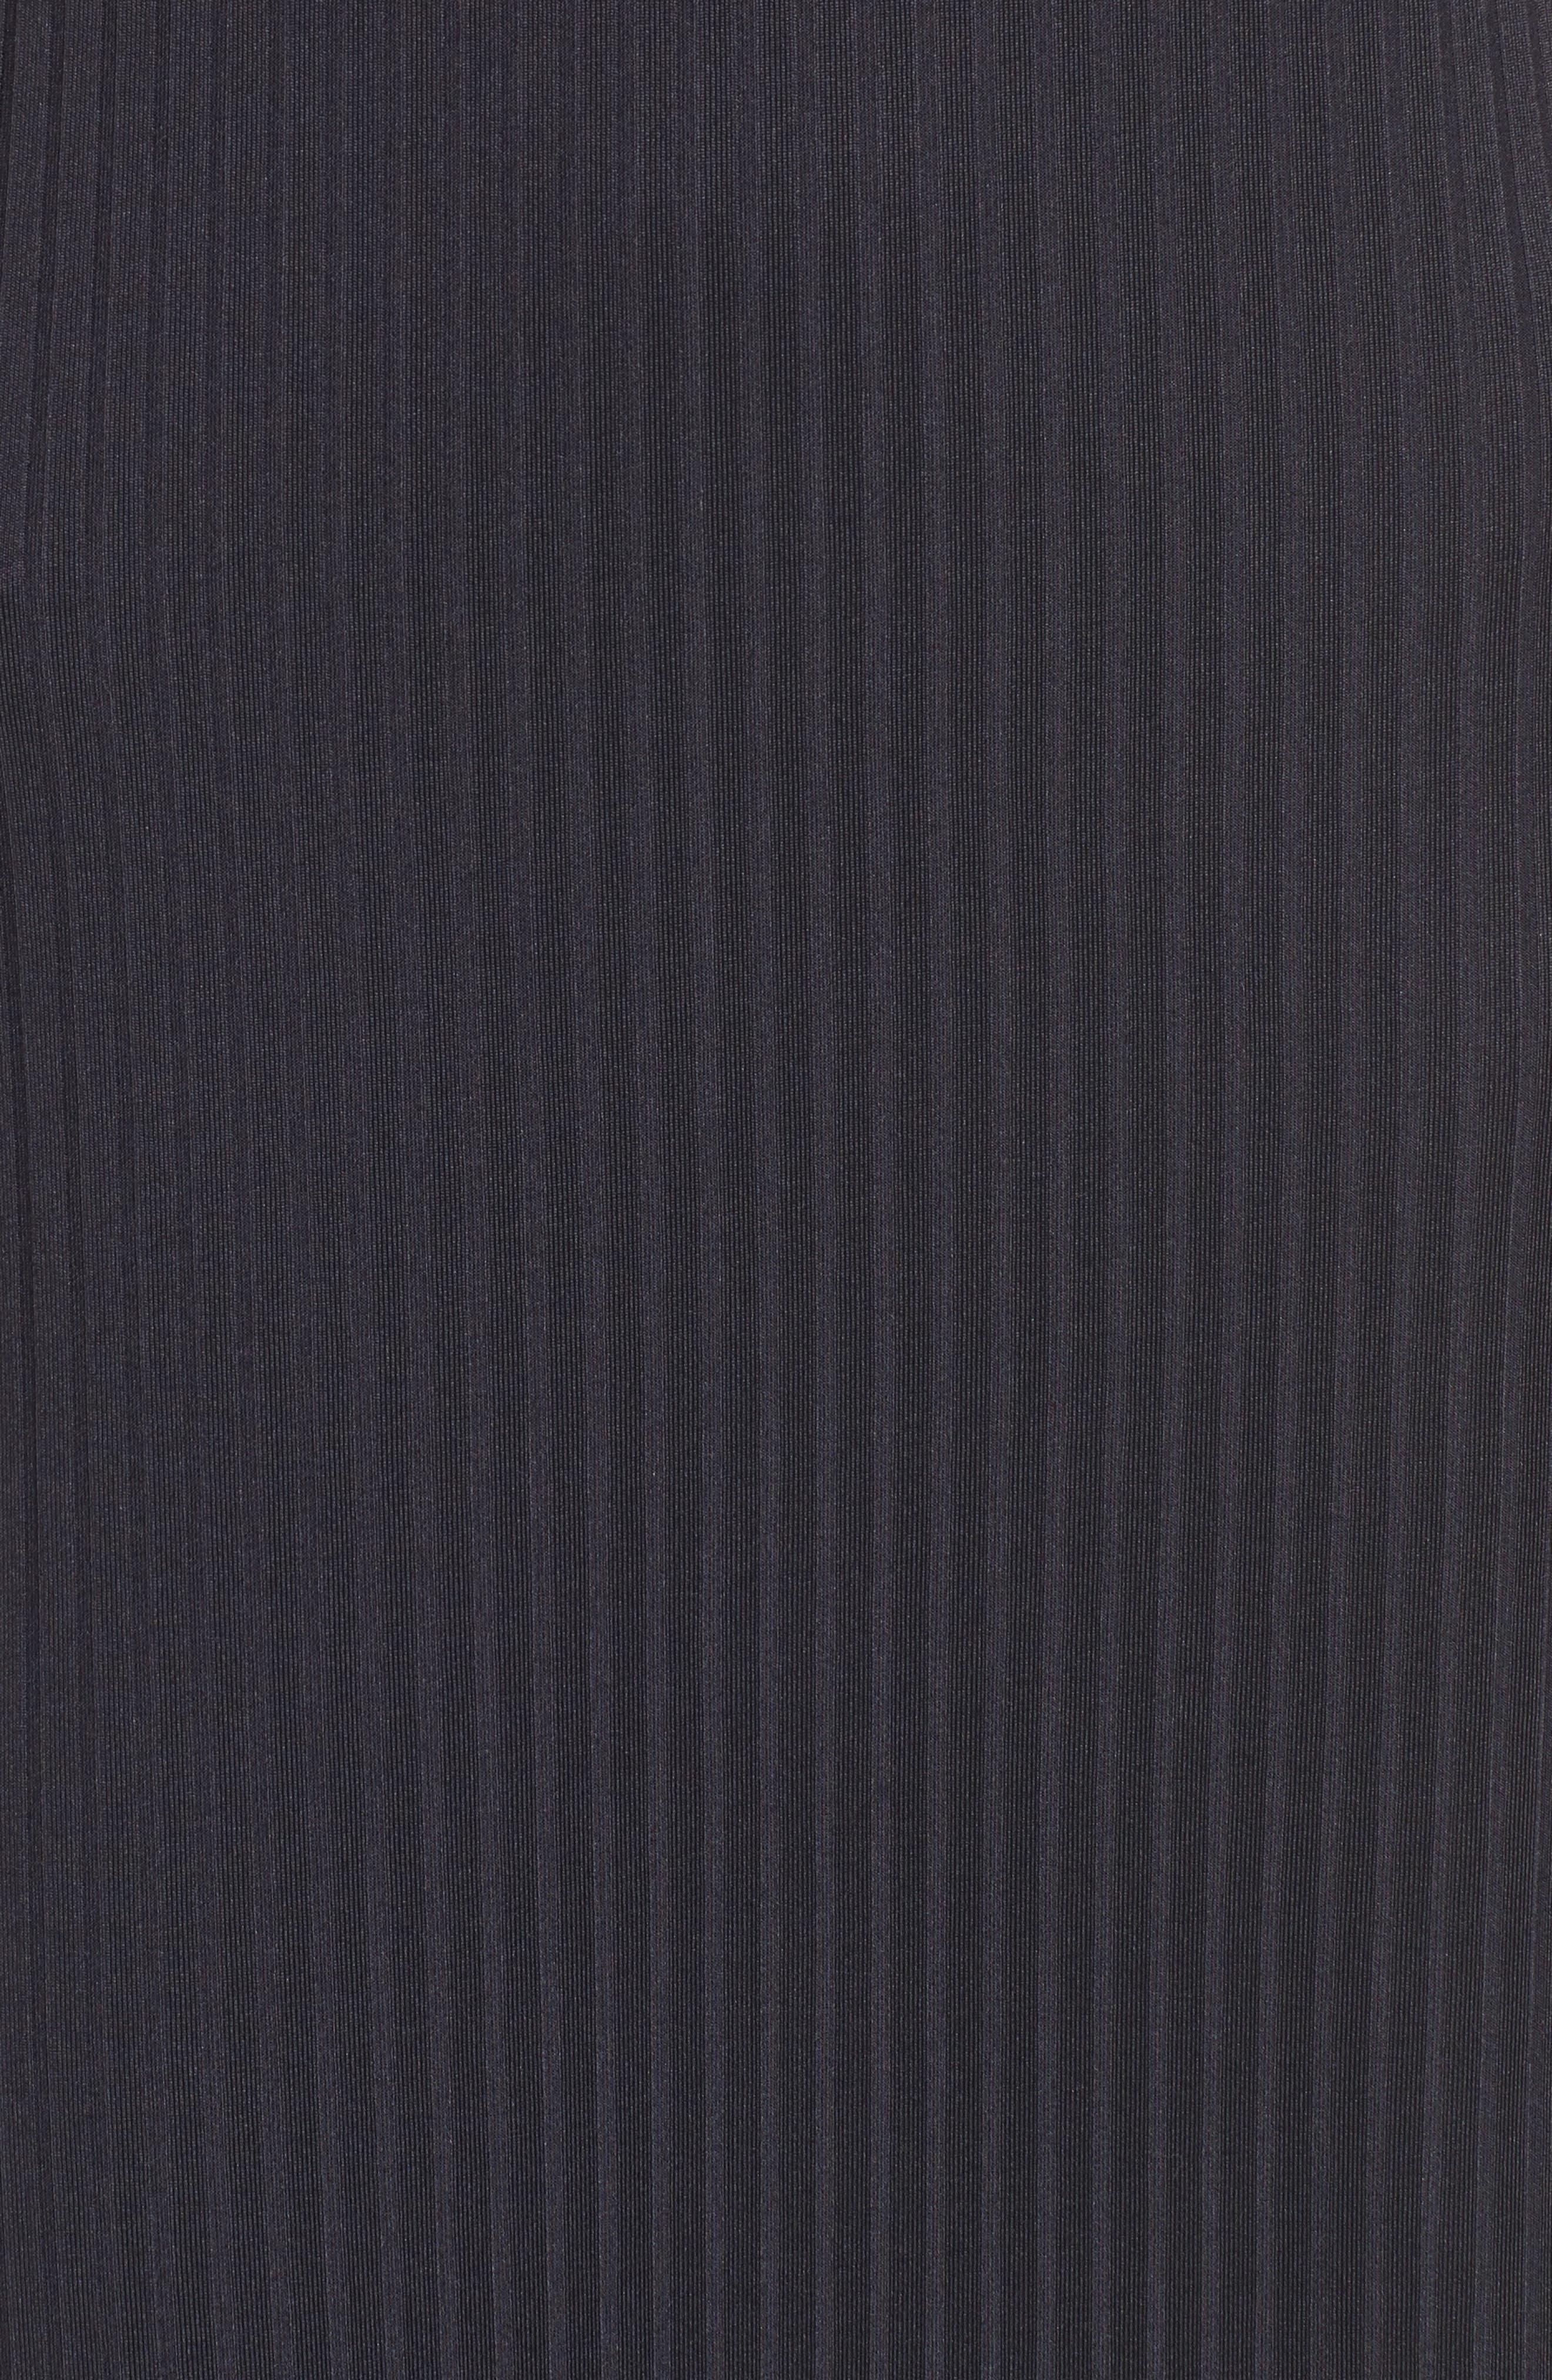 Ashlynn Ribbed Maxi Dress,                             Alternate thumbnail 5, color,                             401